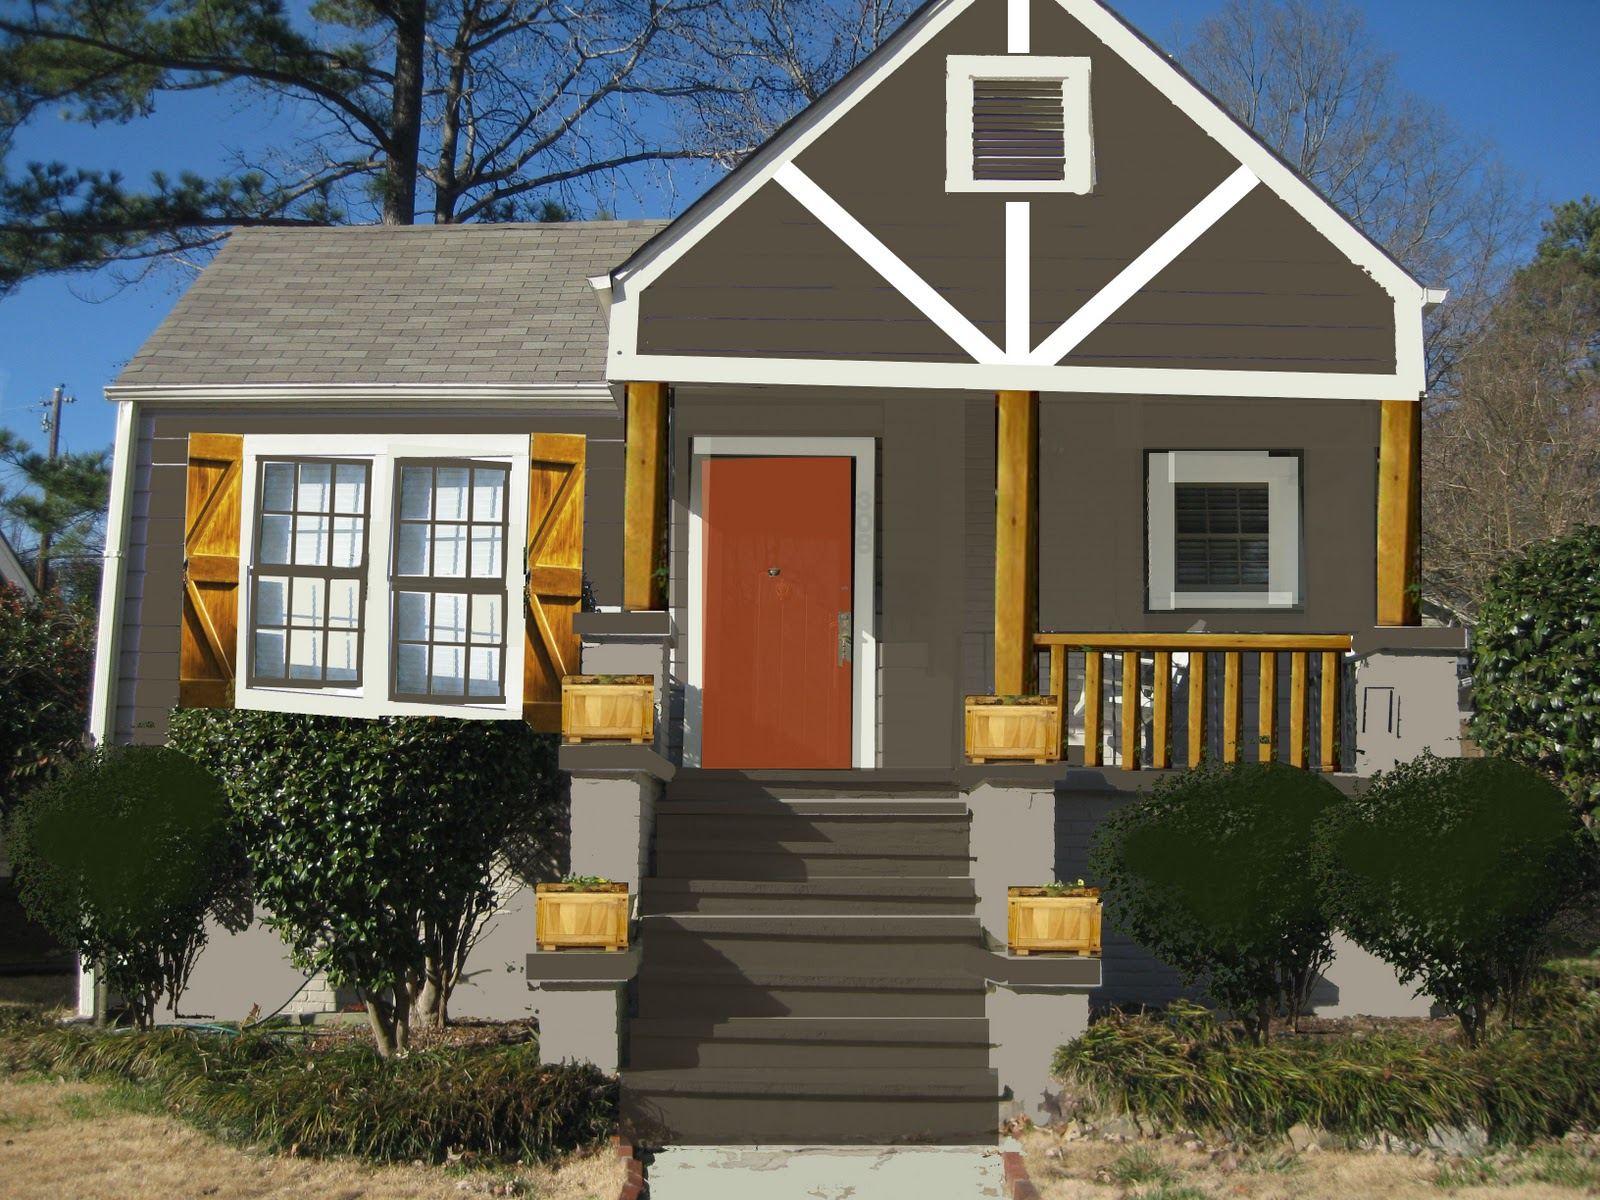 Exterior House Colors: A Walk Through: Exterior Gratification